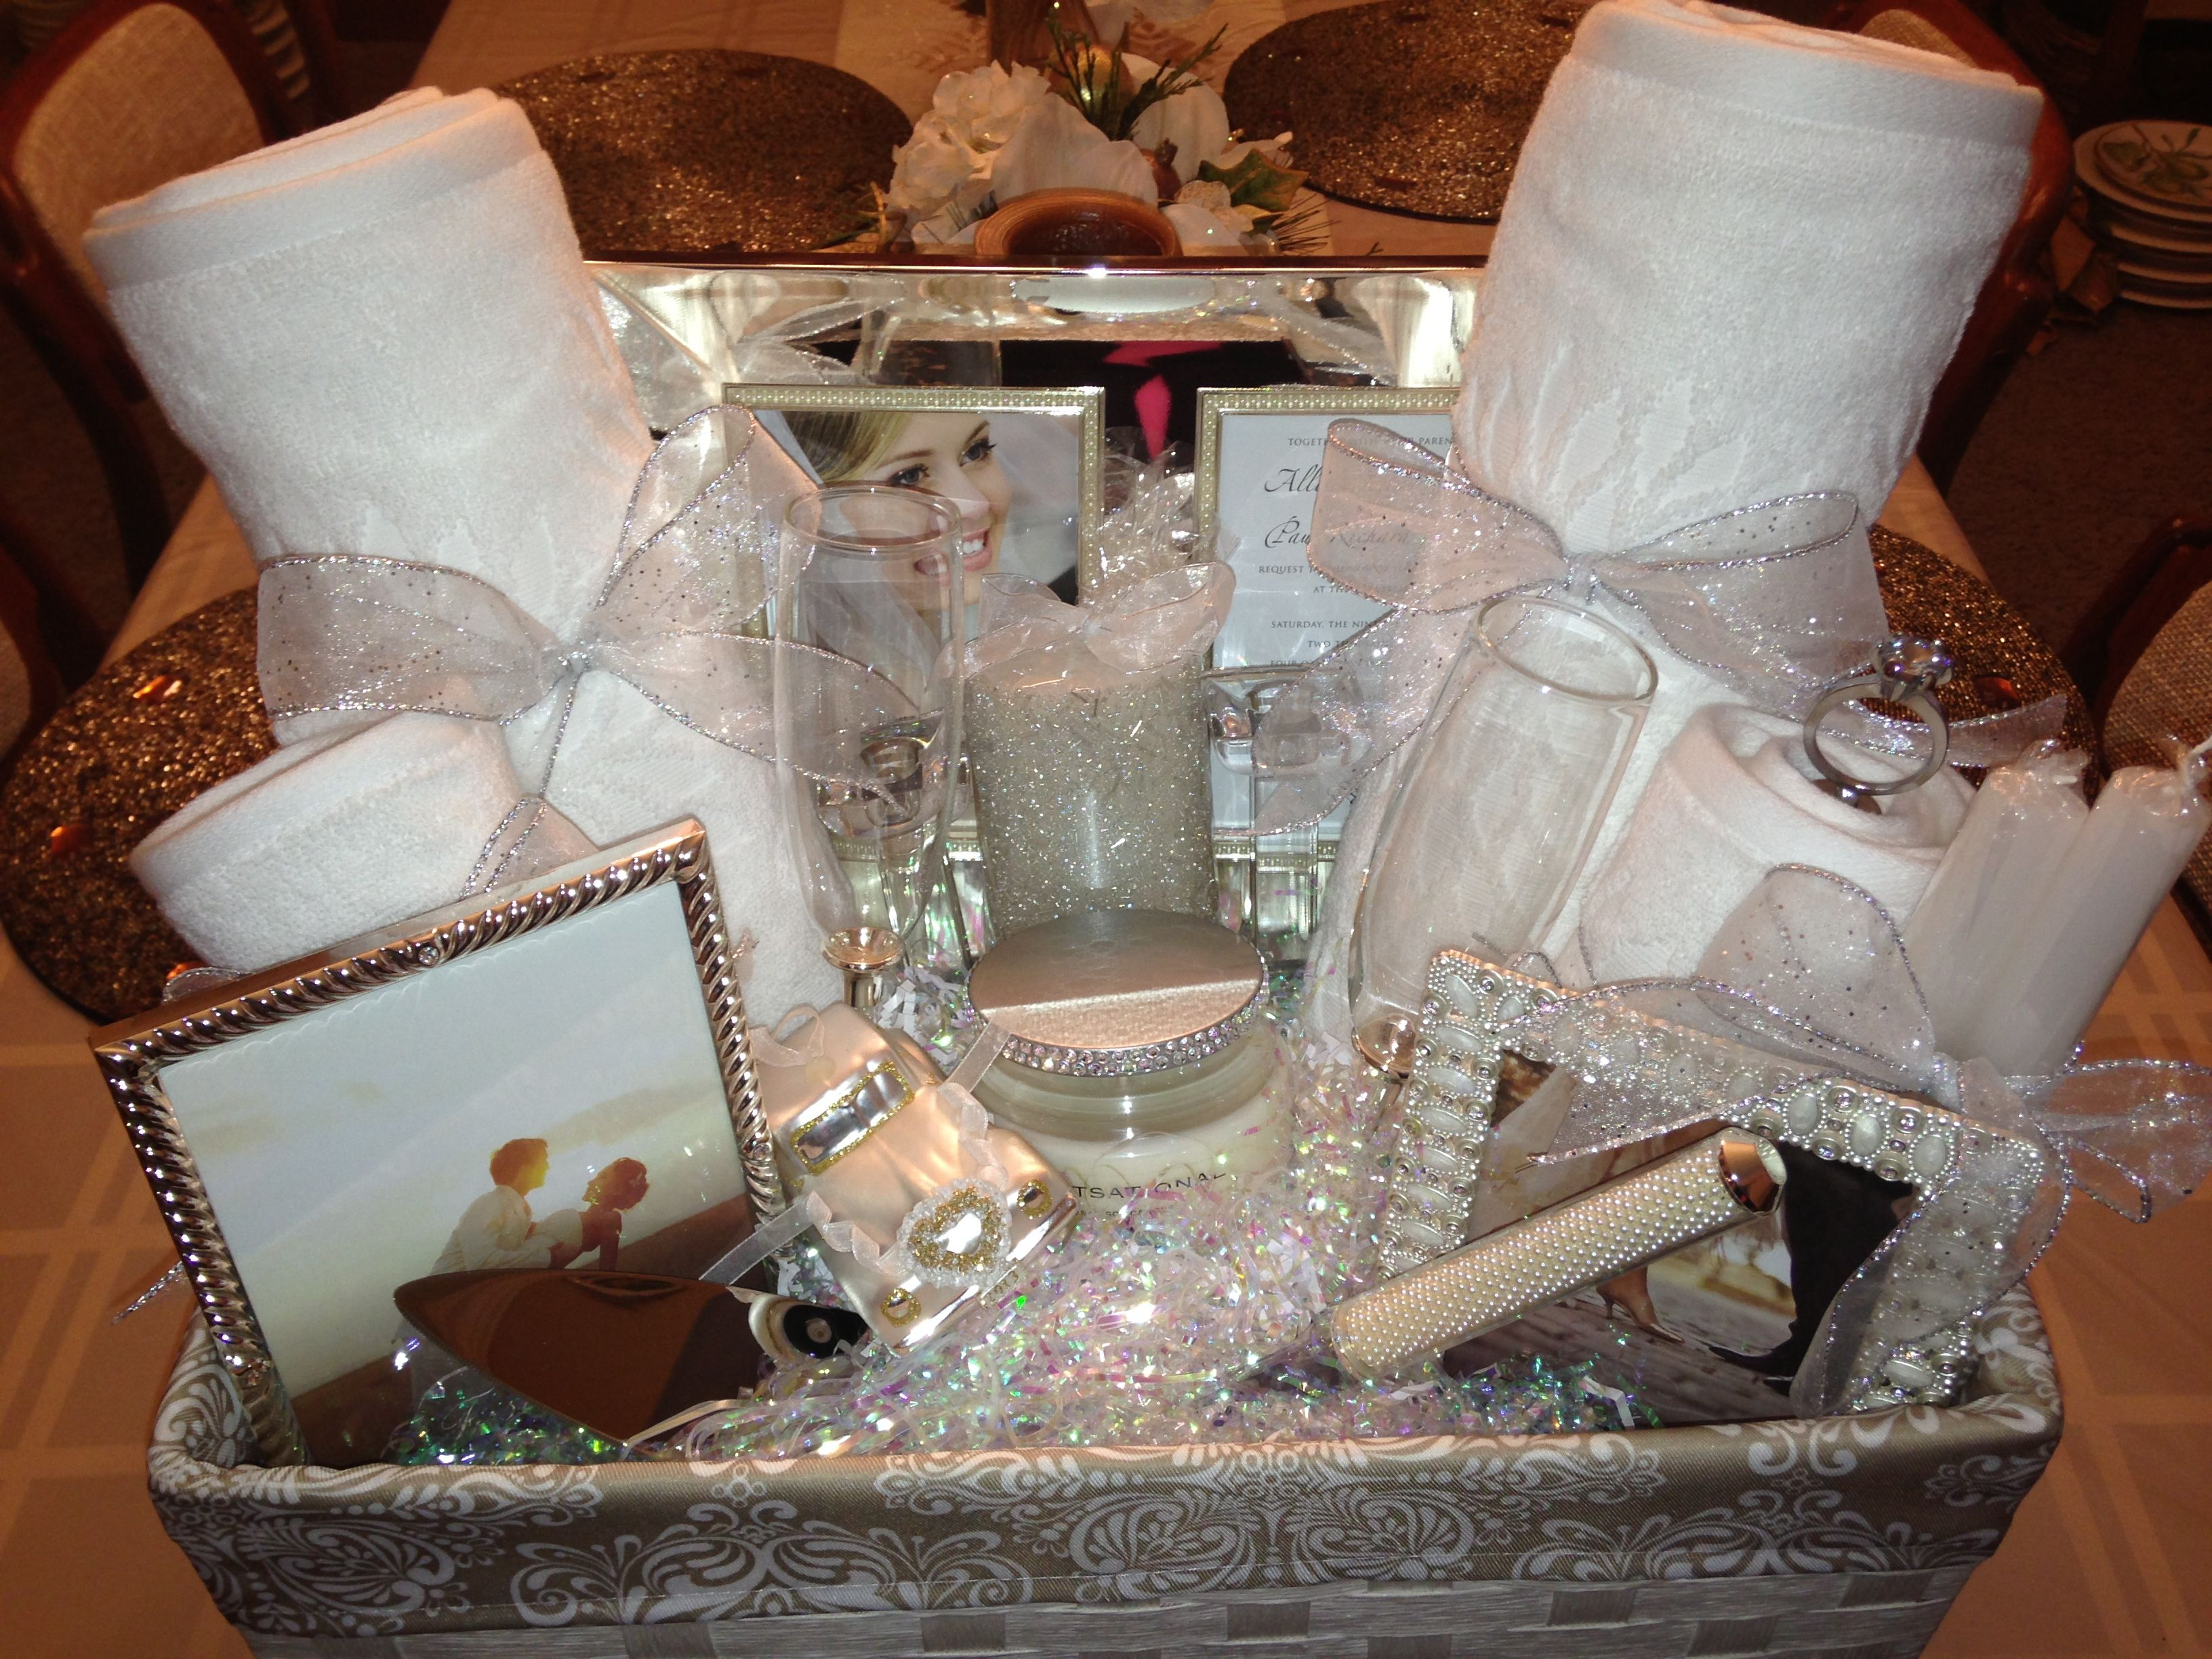 Bridal Shower Gift Basket Ideas. Ideasthatsparkle.com On